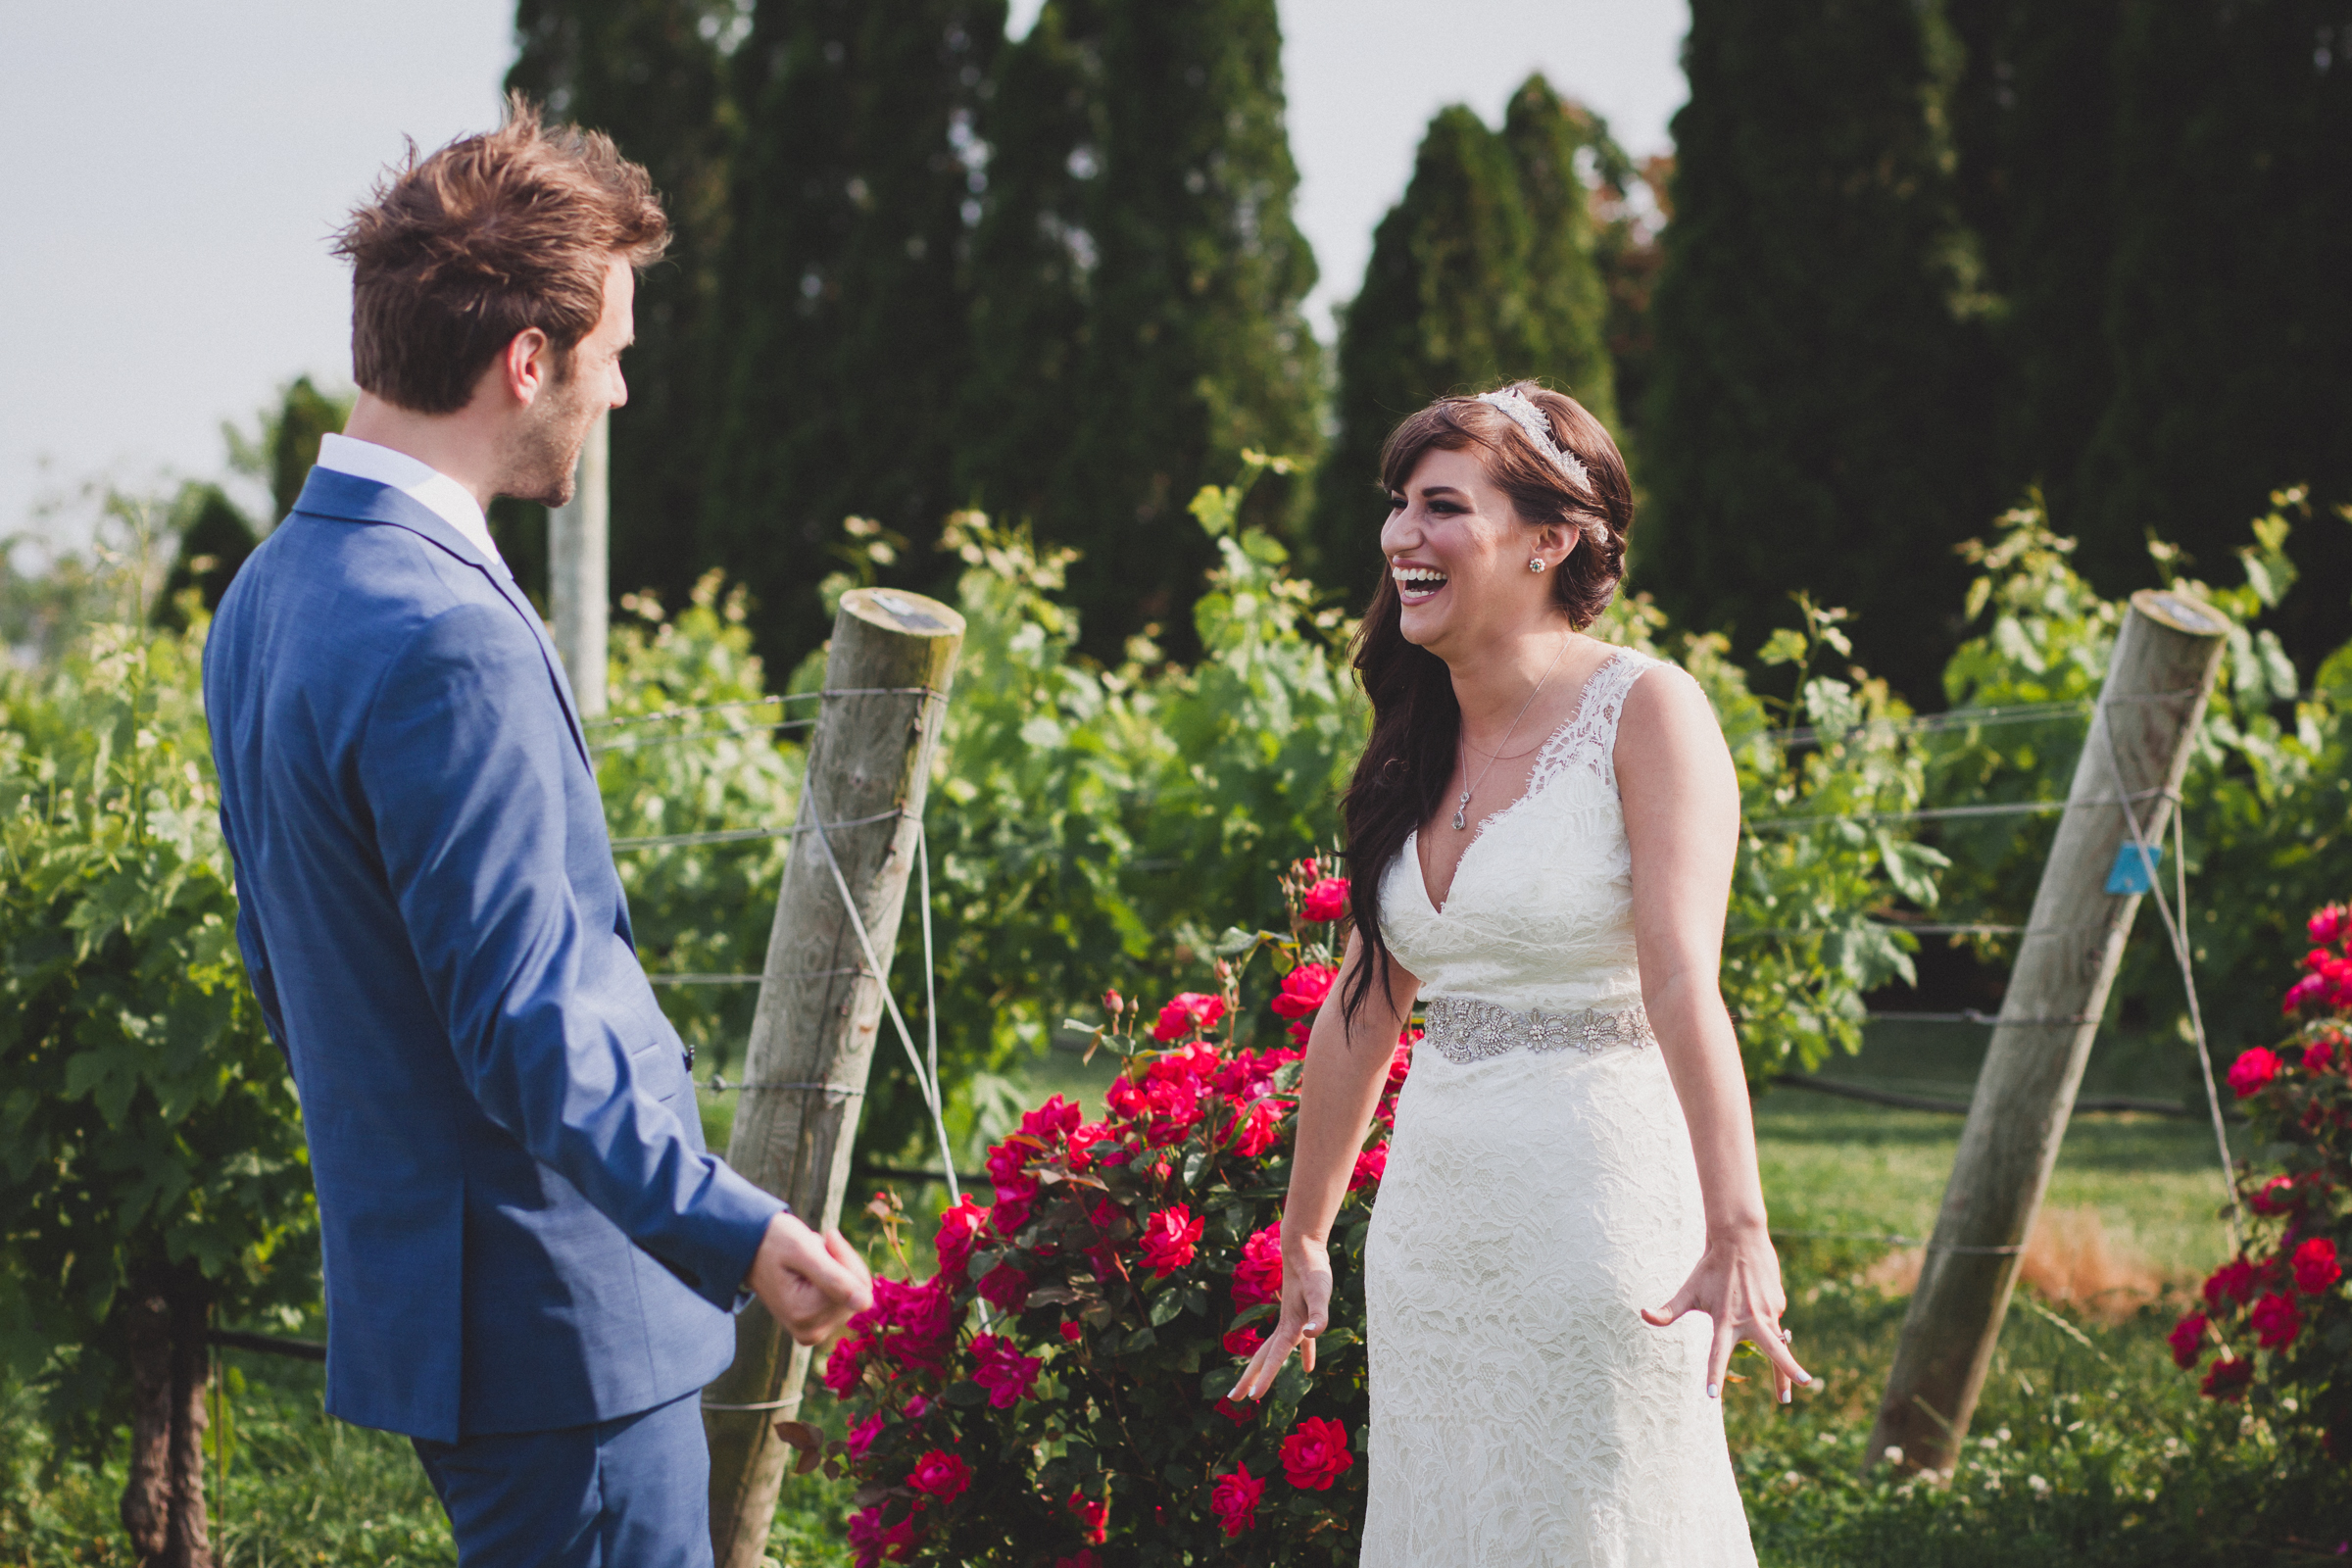 Martha-Clara-Vineyard-Long-Island-Documentary-Wedding-Photographer-26.jpg